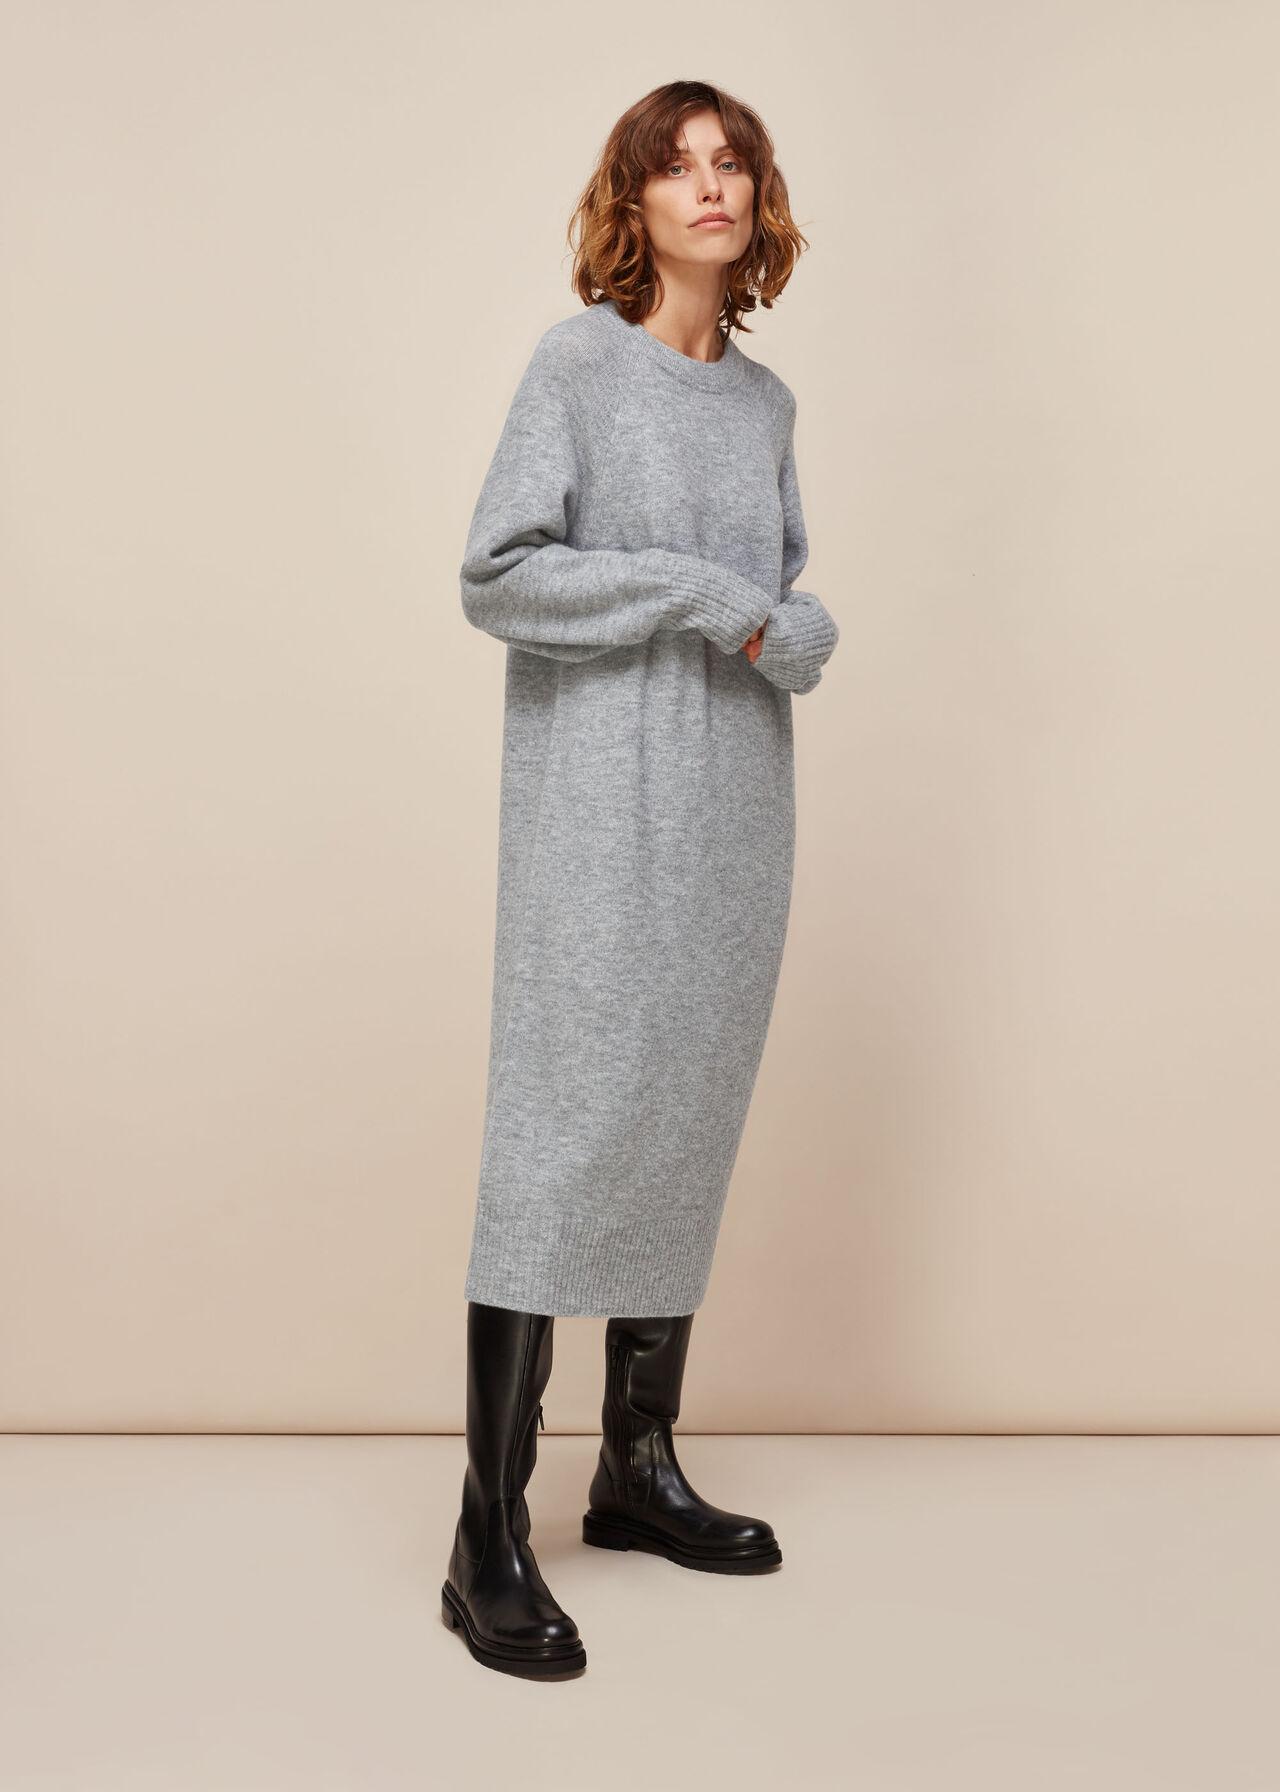 Midi Length Knit Dress